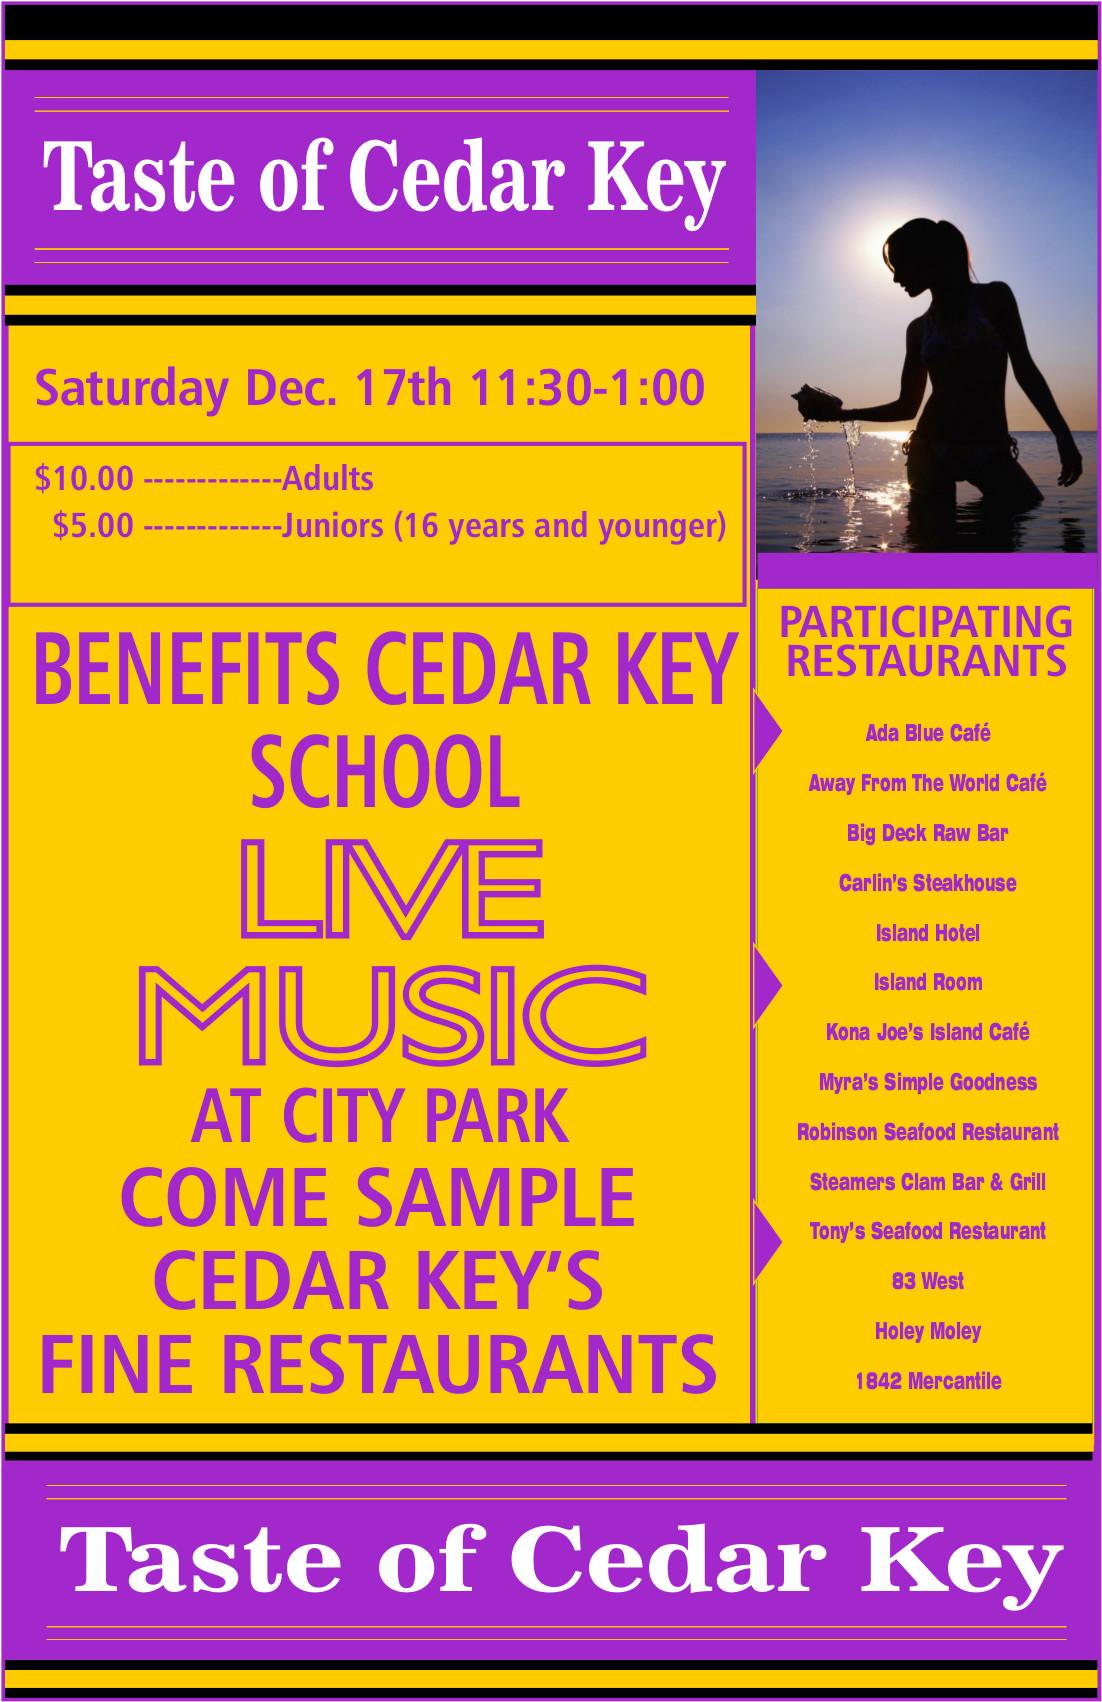 DEC 5 taste of cedar key flyer